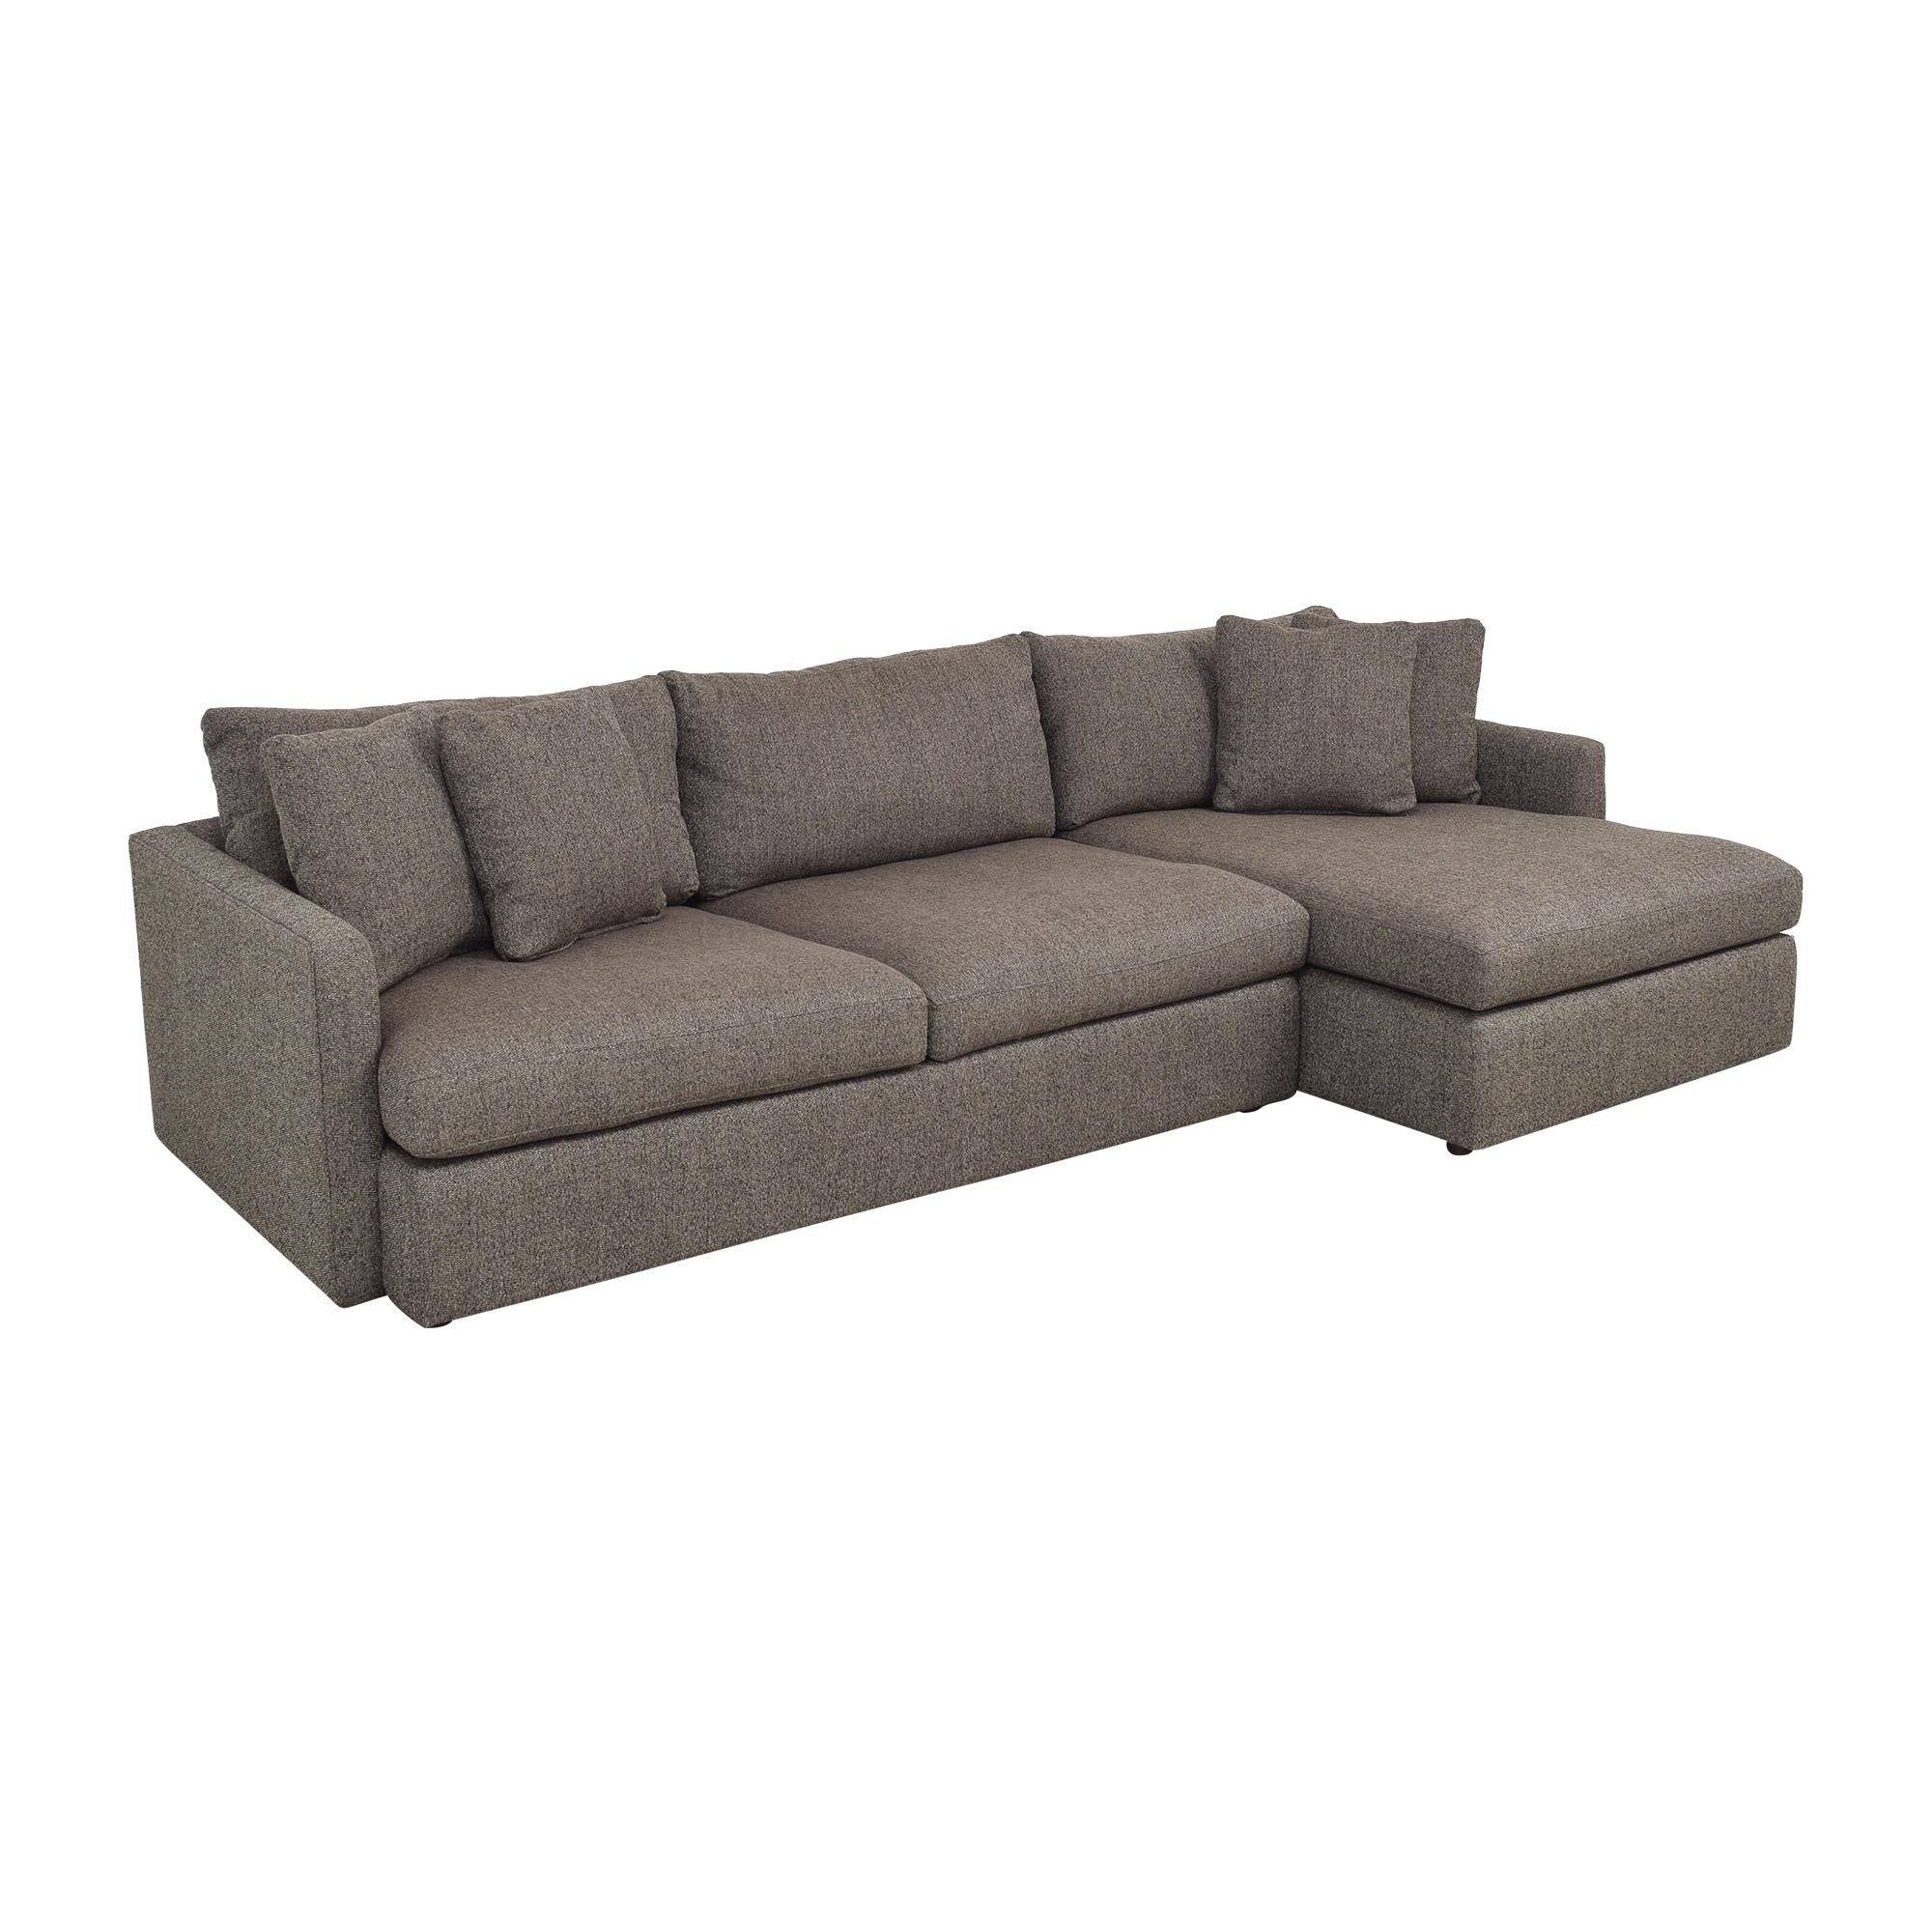 Crate & Barrel Crate & Barrel Lounge II 2-Piece Sectional Sofa ct